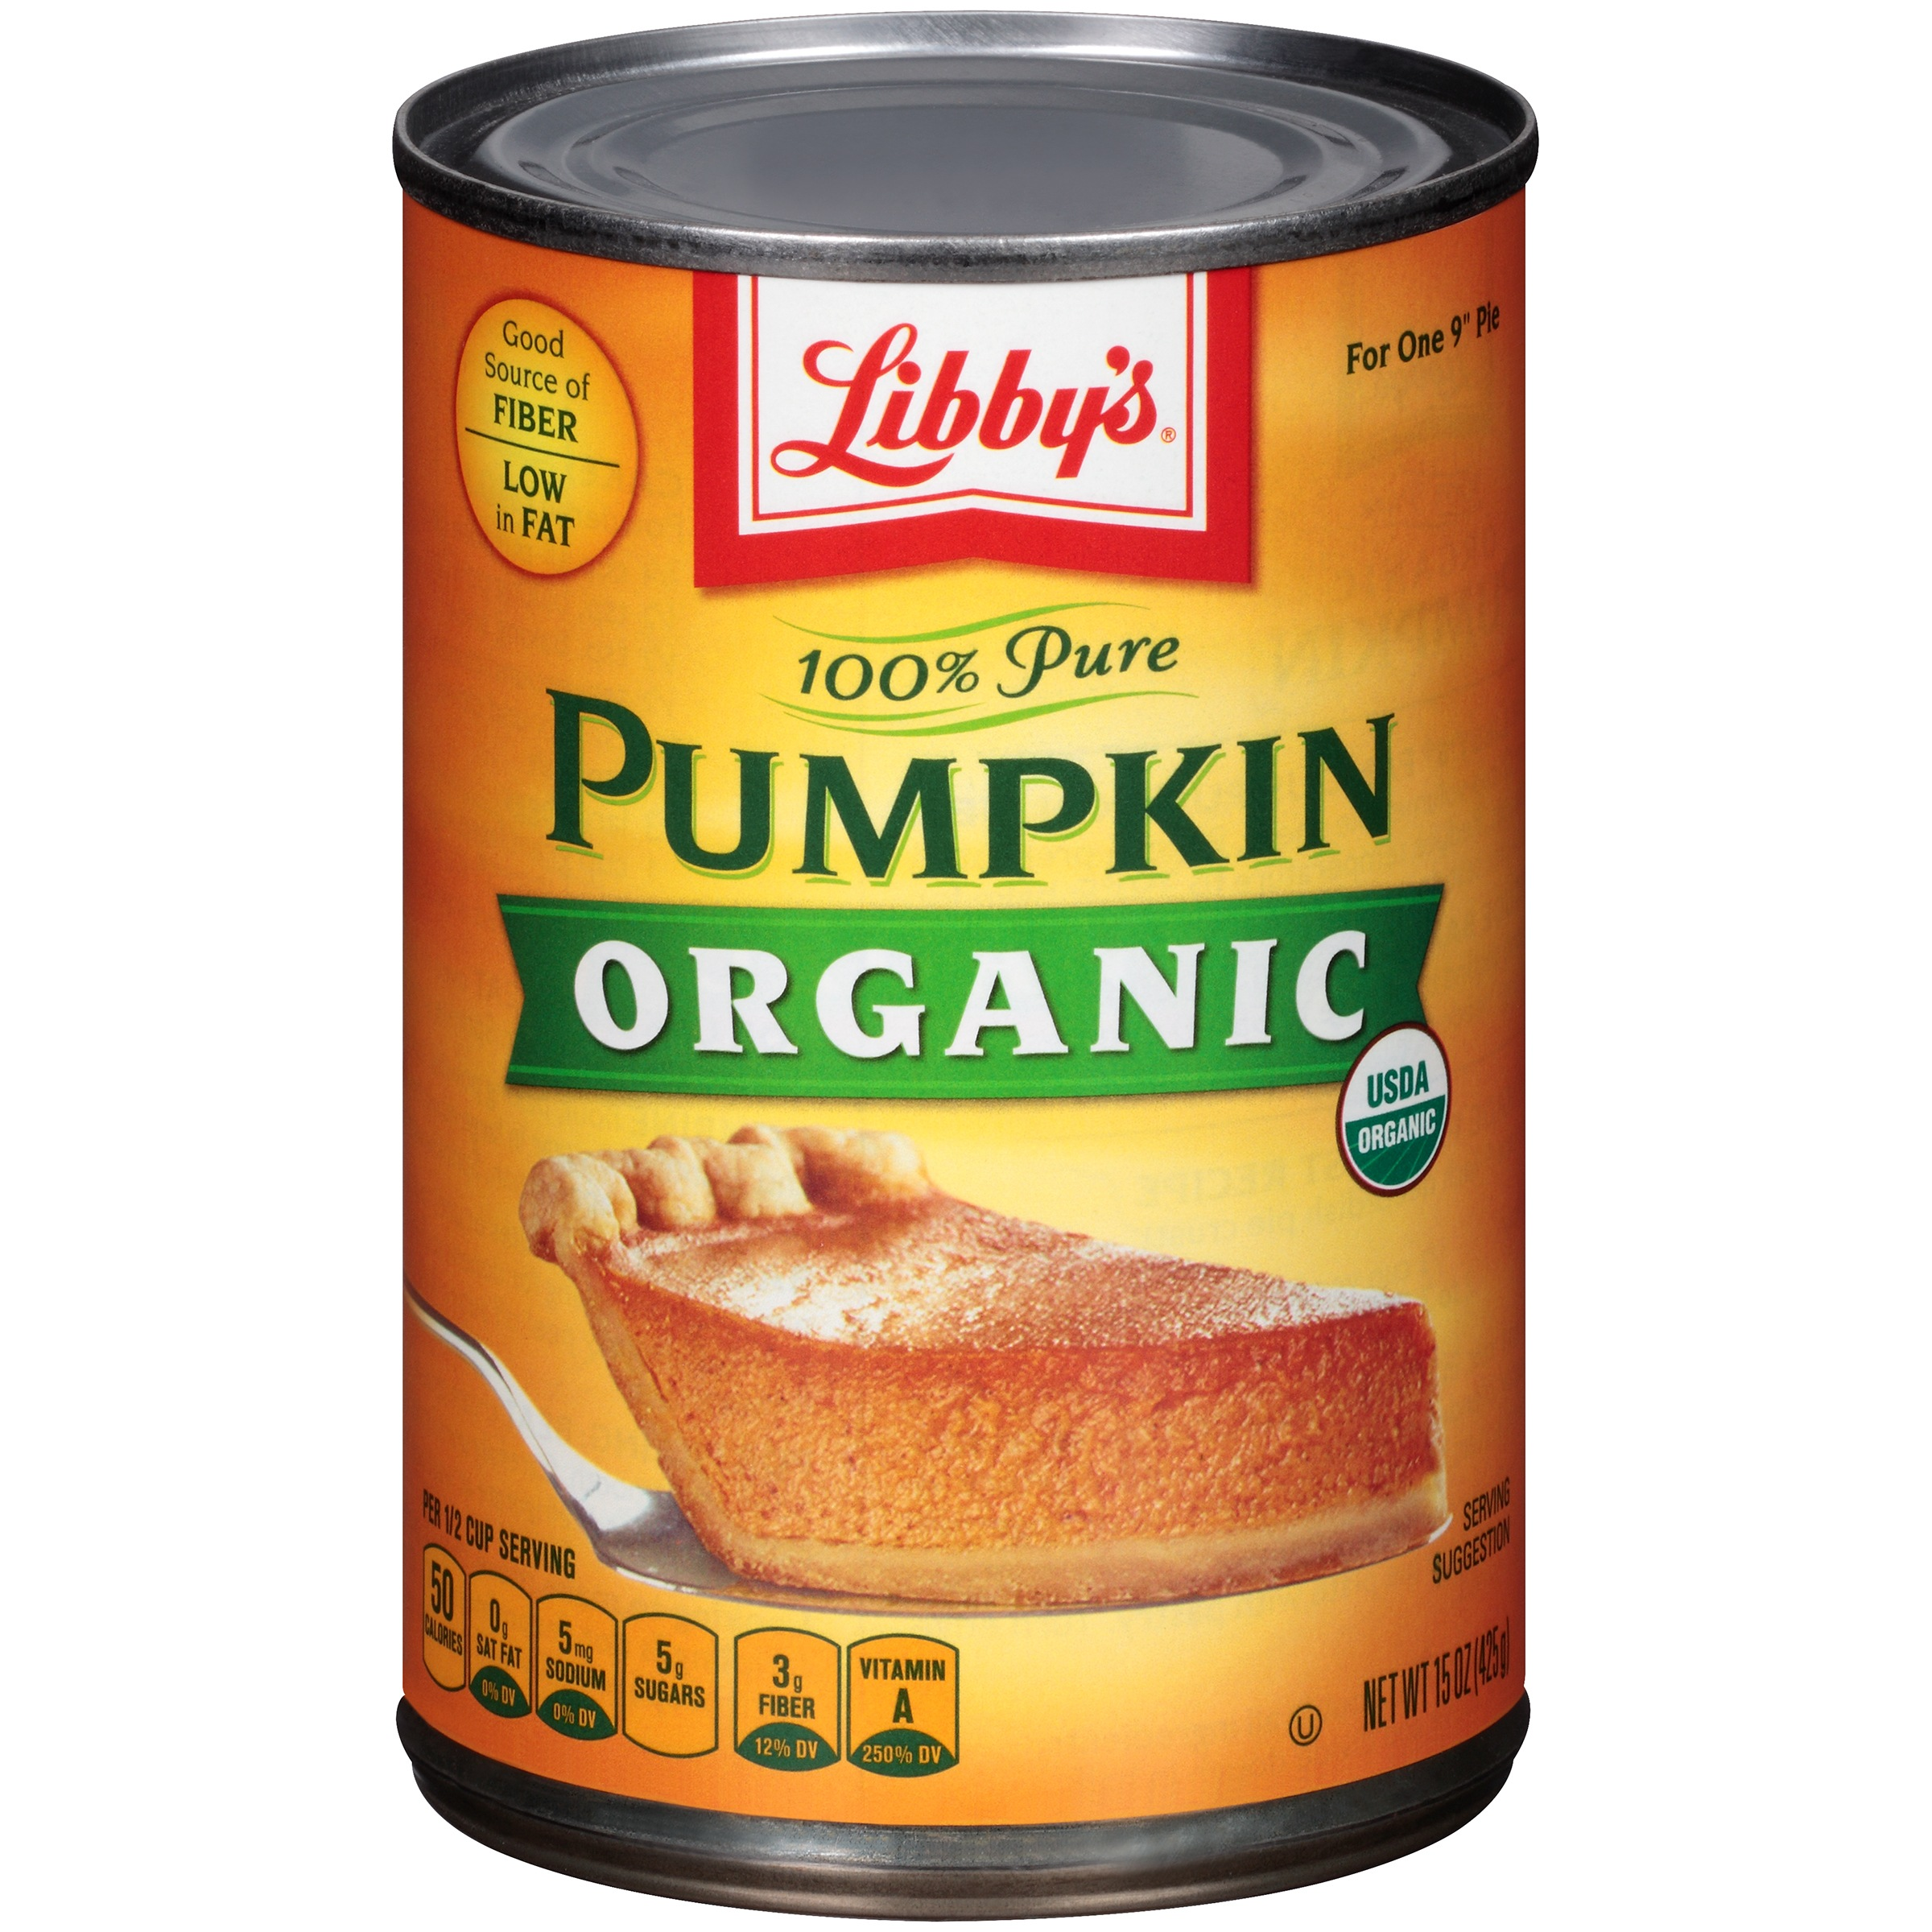 (3 Pack) LIBBY'S 100% Pure Organic Pumpkin 15 oz. Can